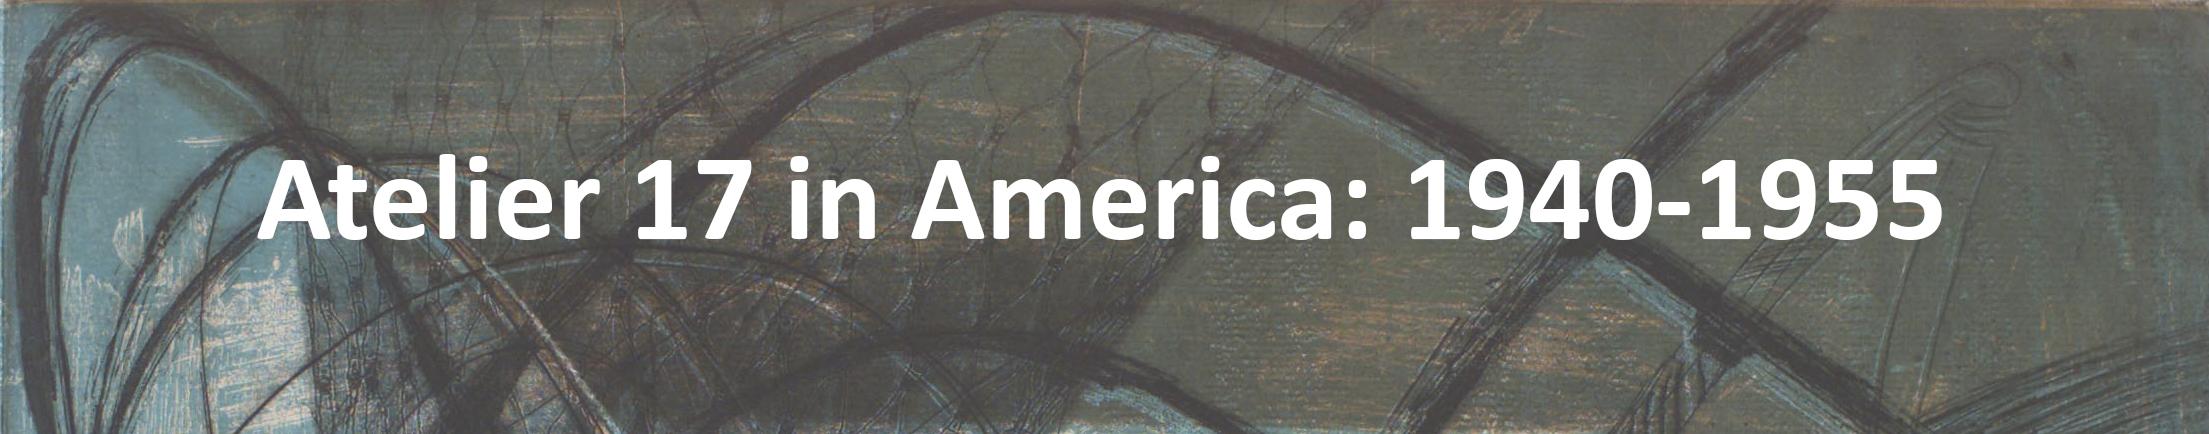 Atelier 17 in America